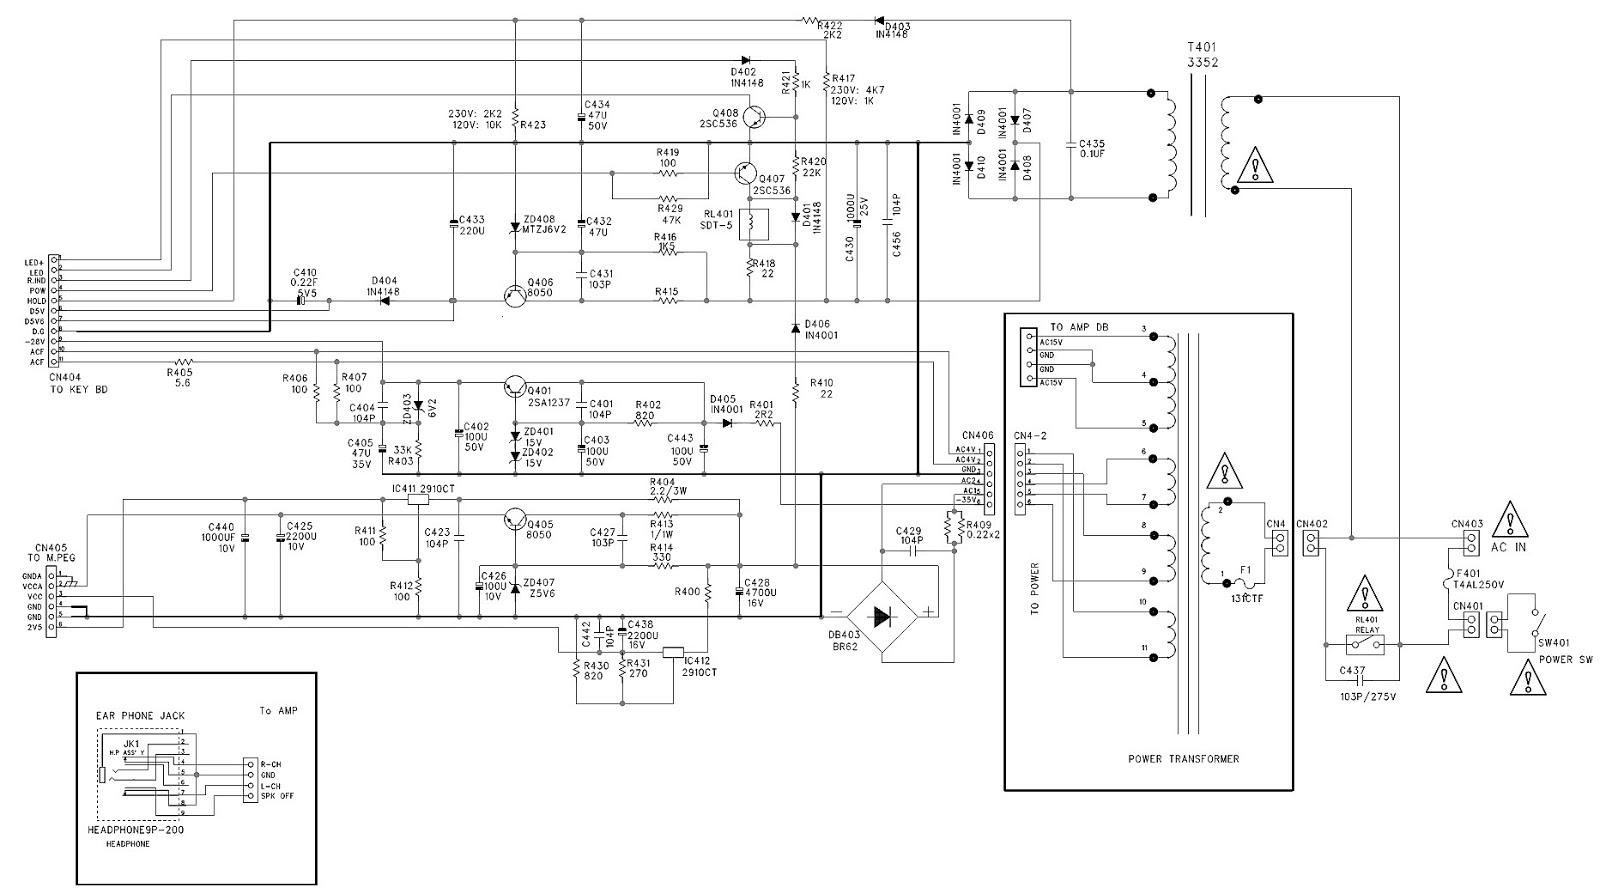 Home Power Saver Circuit Diagram Chrysler Sebring Radio Wiring Akira Hts28dvd Theater System Schematic